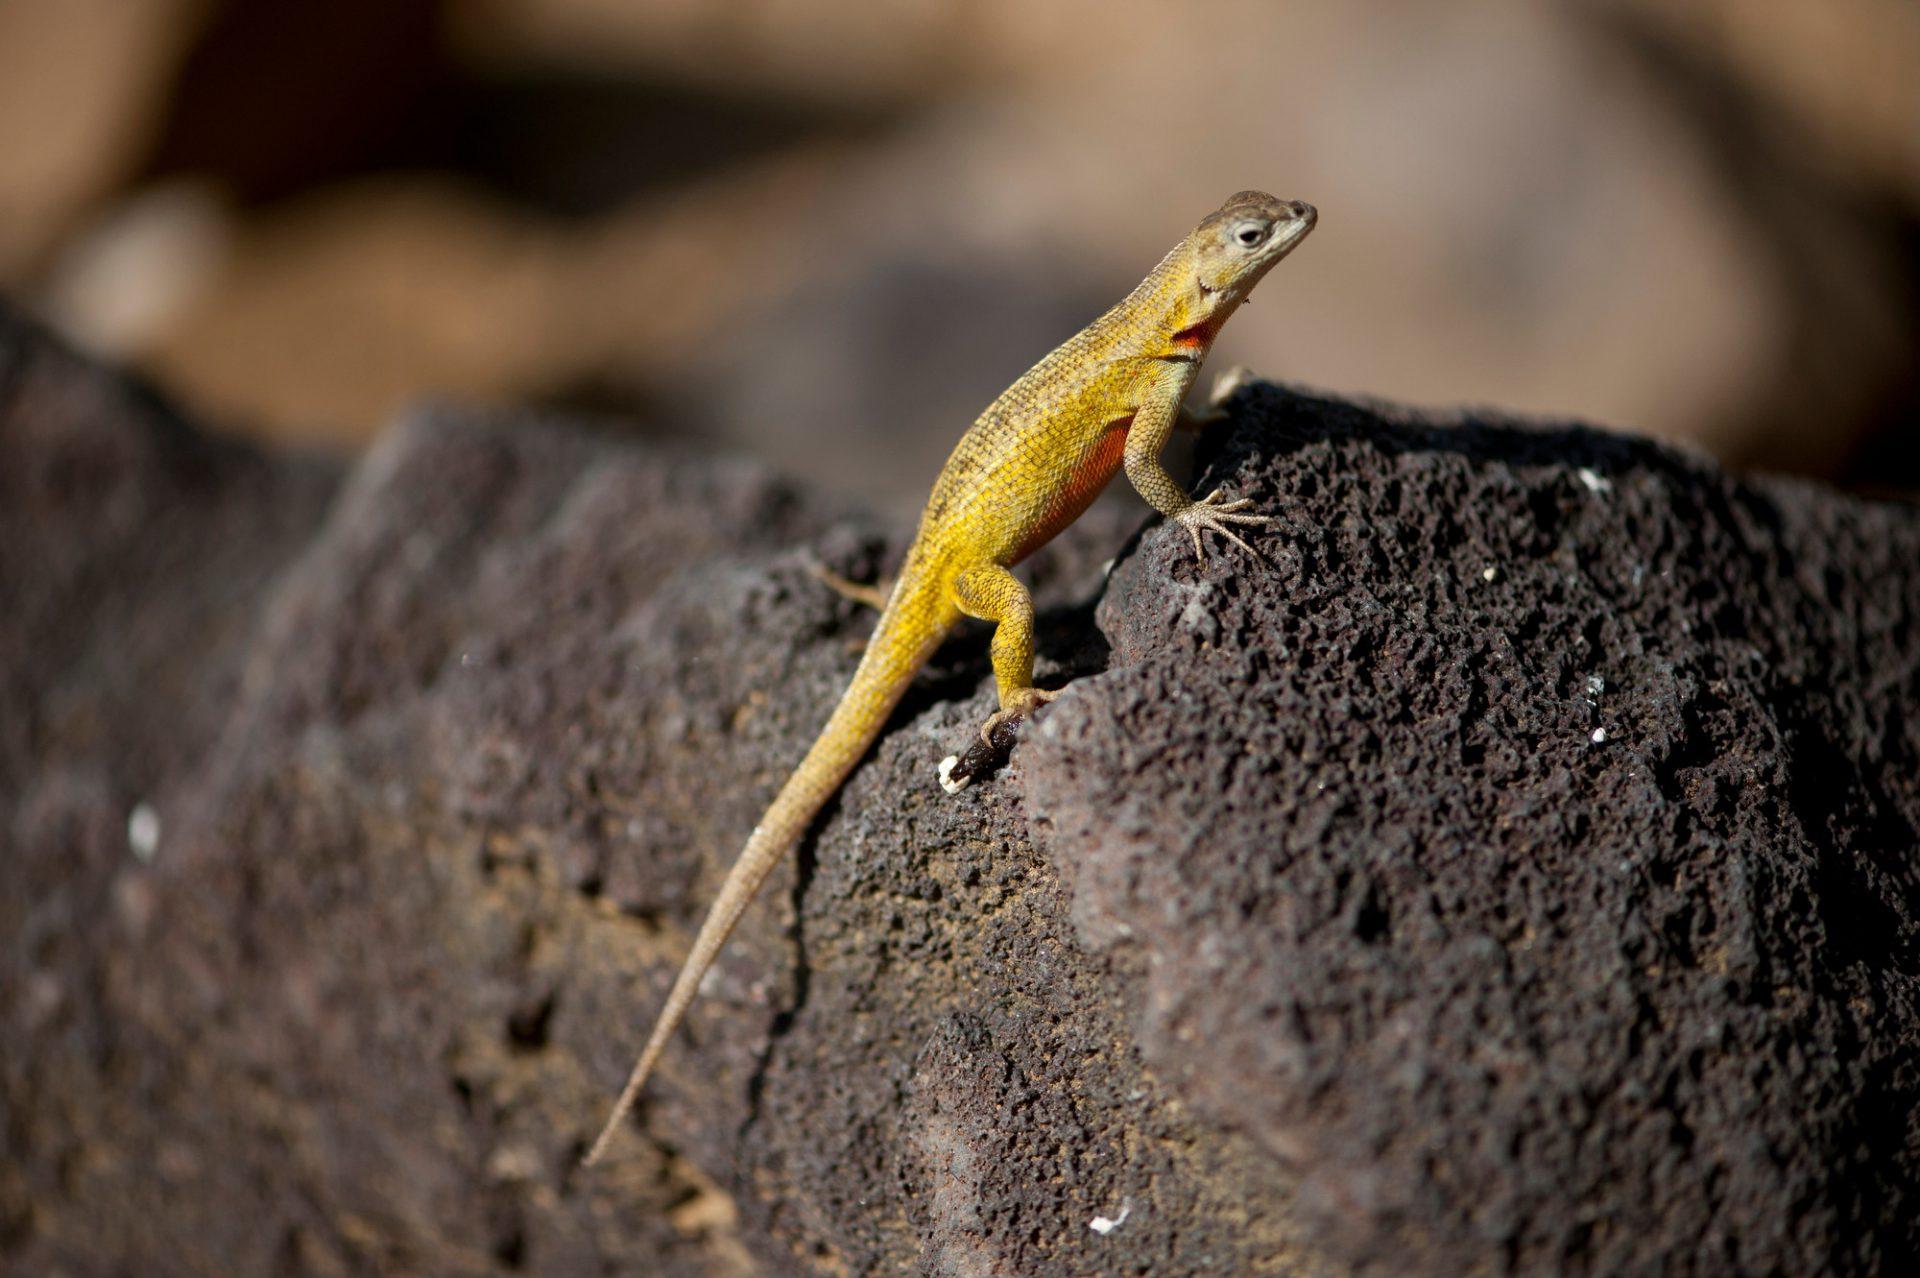 Photo: A female San Cristobal lava lizard, Microlophus bivittatus, on San Cristobal Island in the Galapagos.